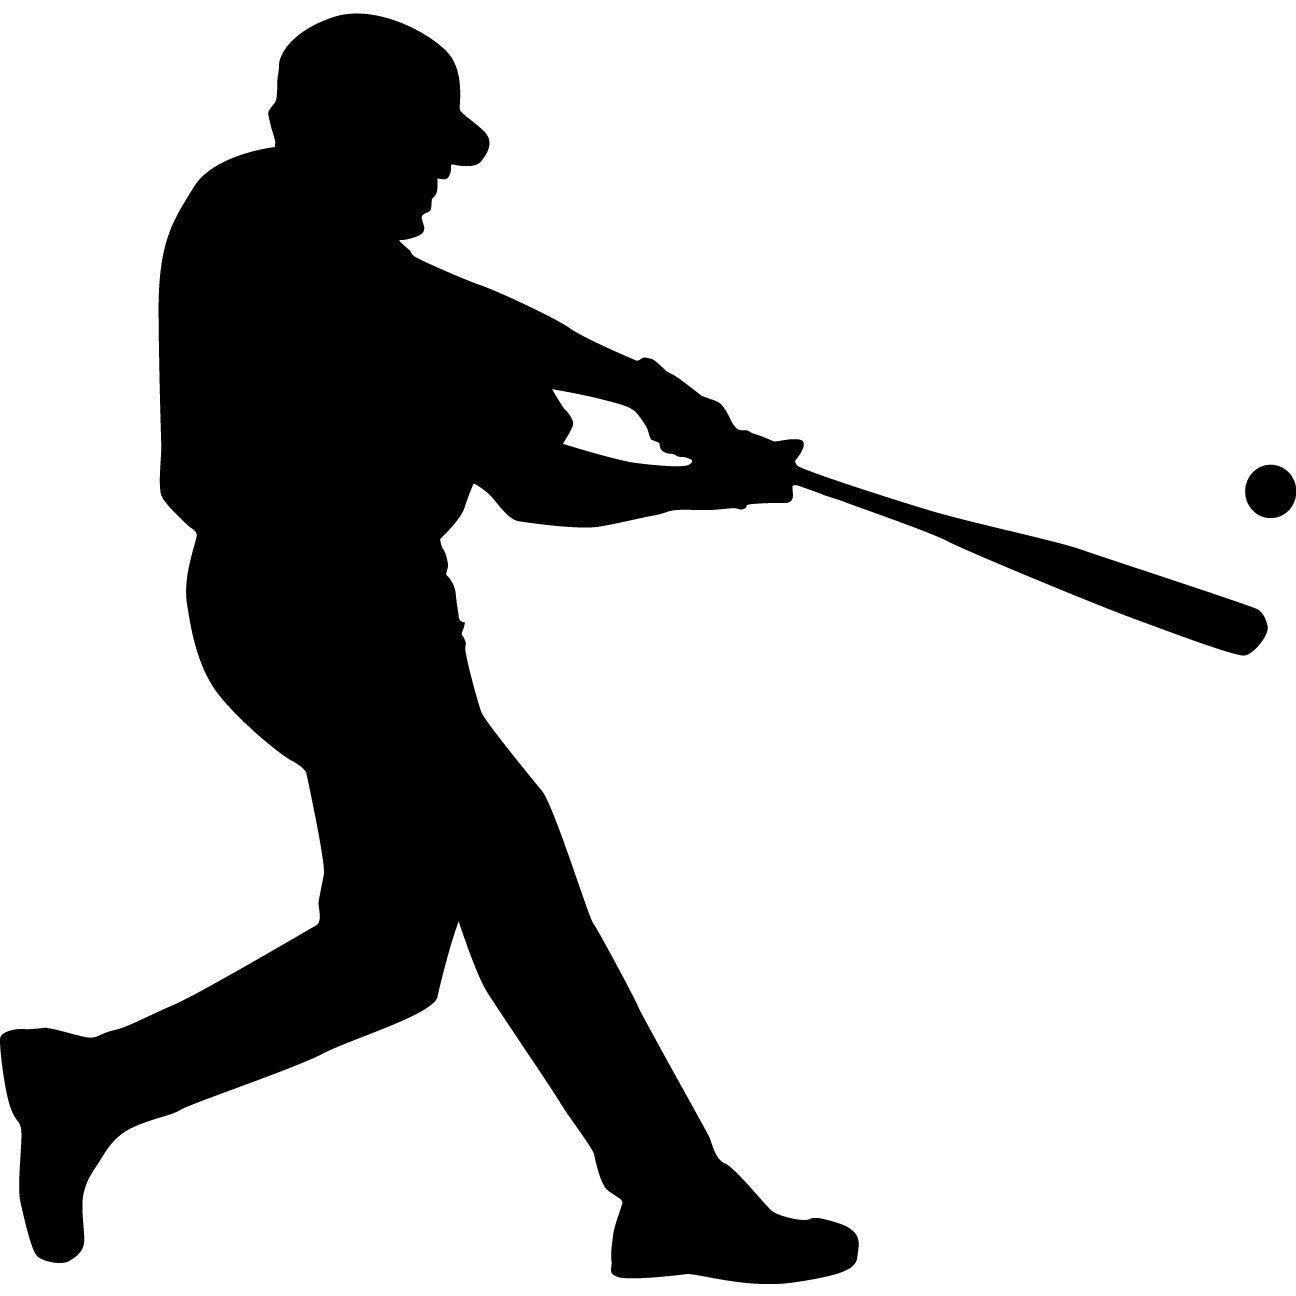 Baseball clipart silhouette. Free cliparts download clip